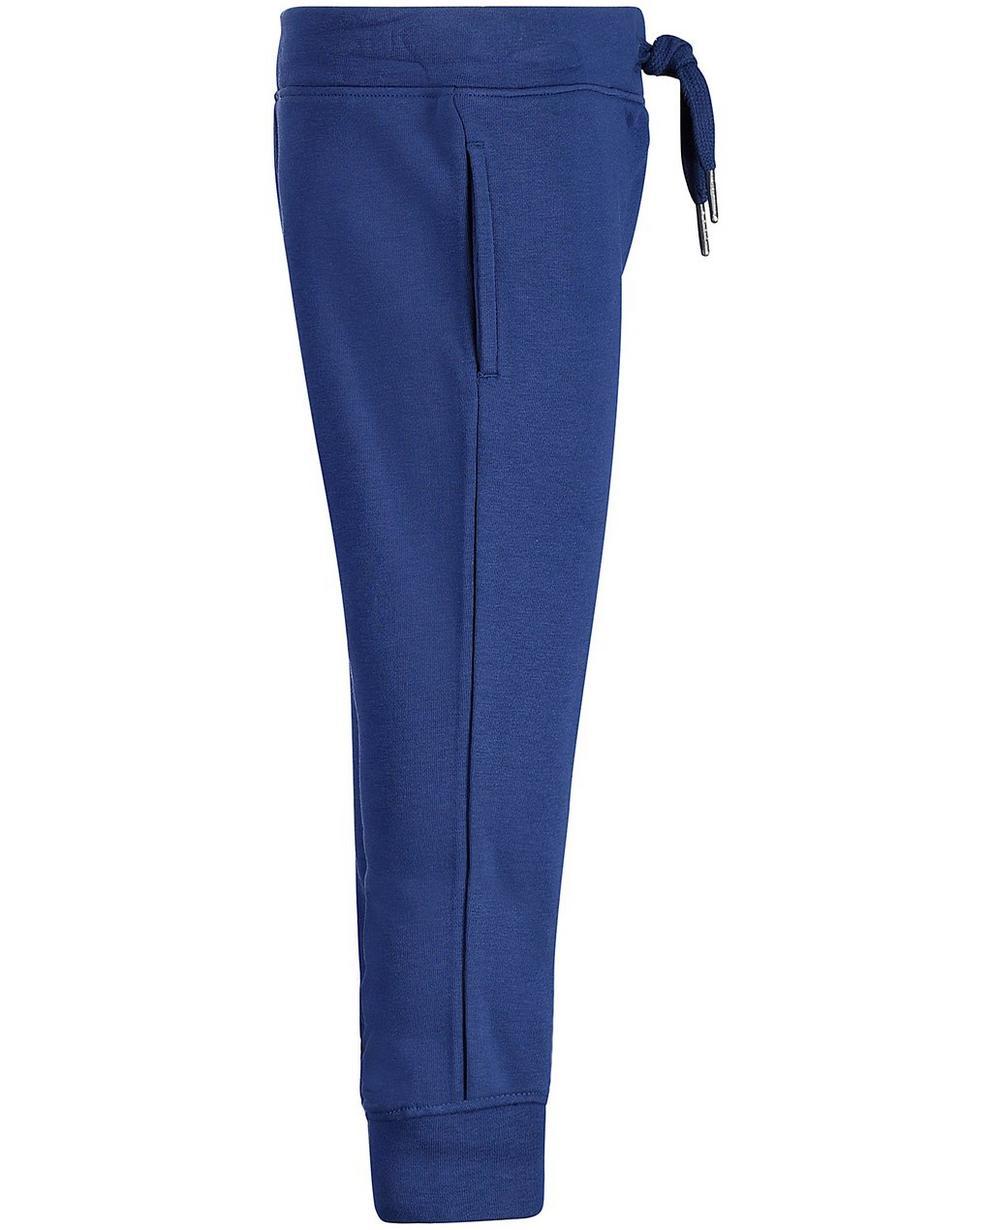 Broeken - BLD - Donkerblauwe sweatbroek